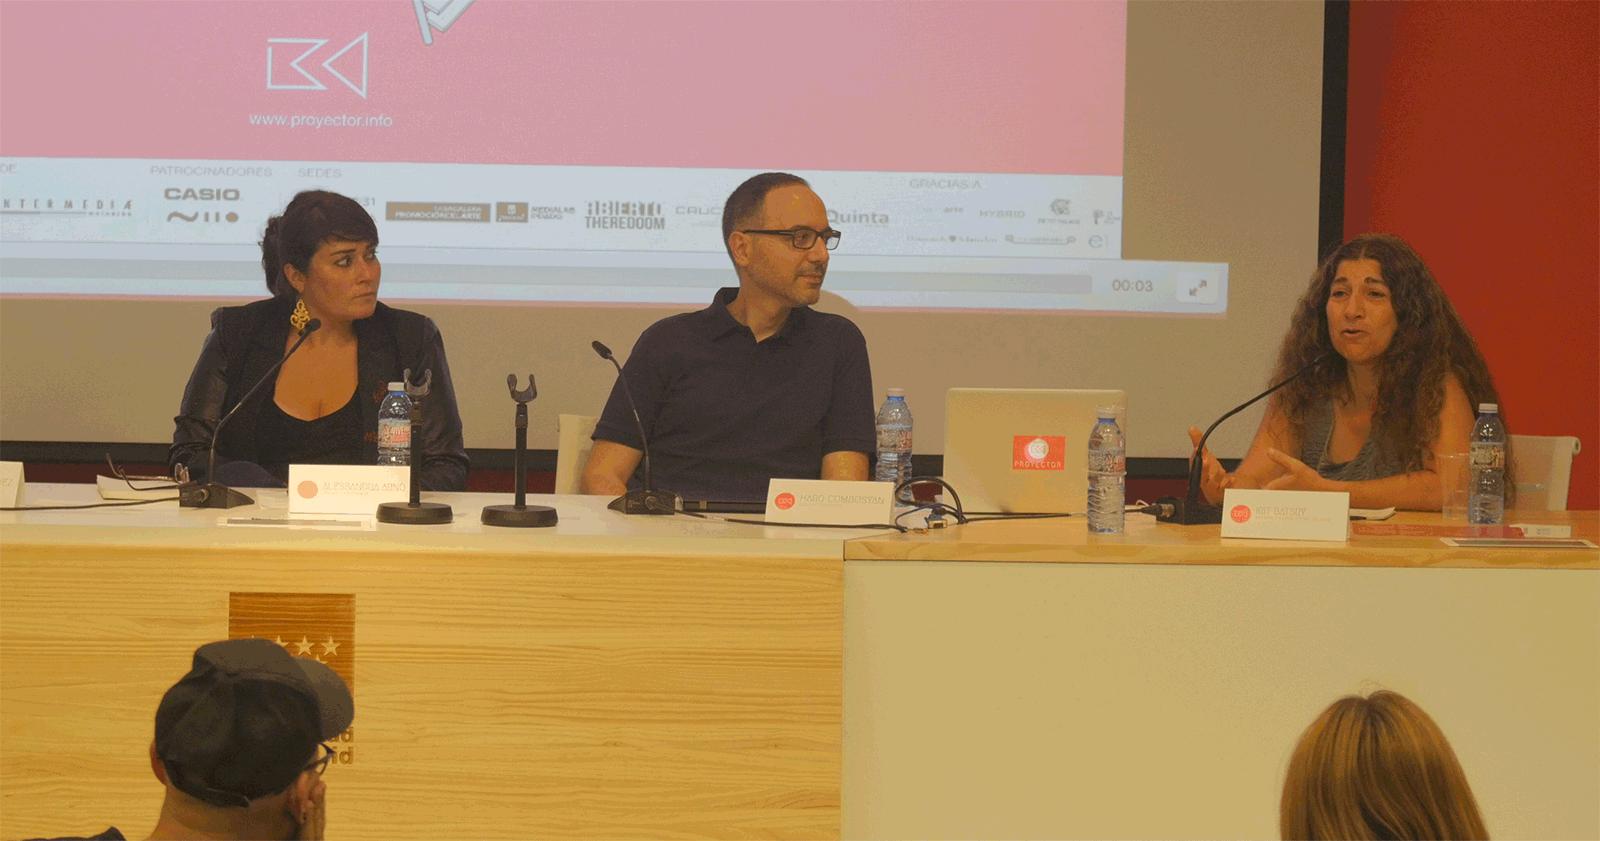 PROYECTOR2017_alcala_encuentro14